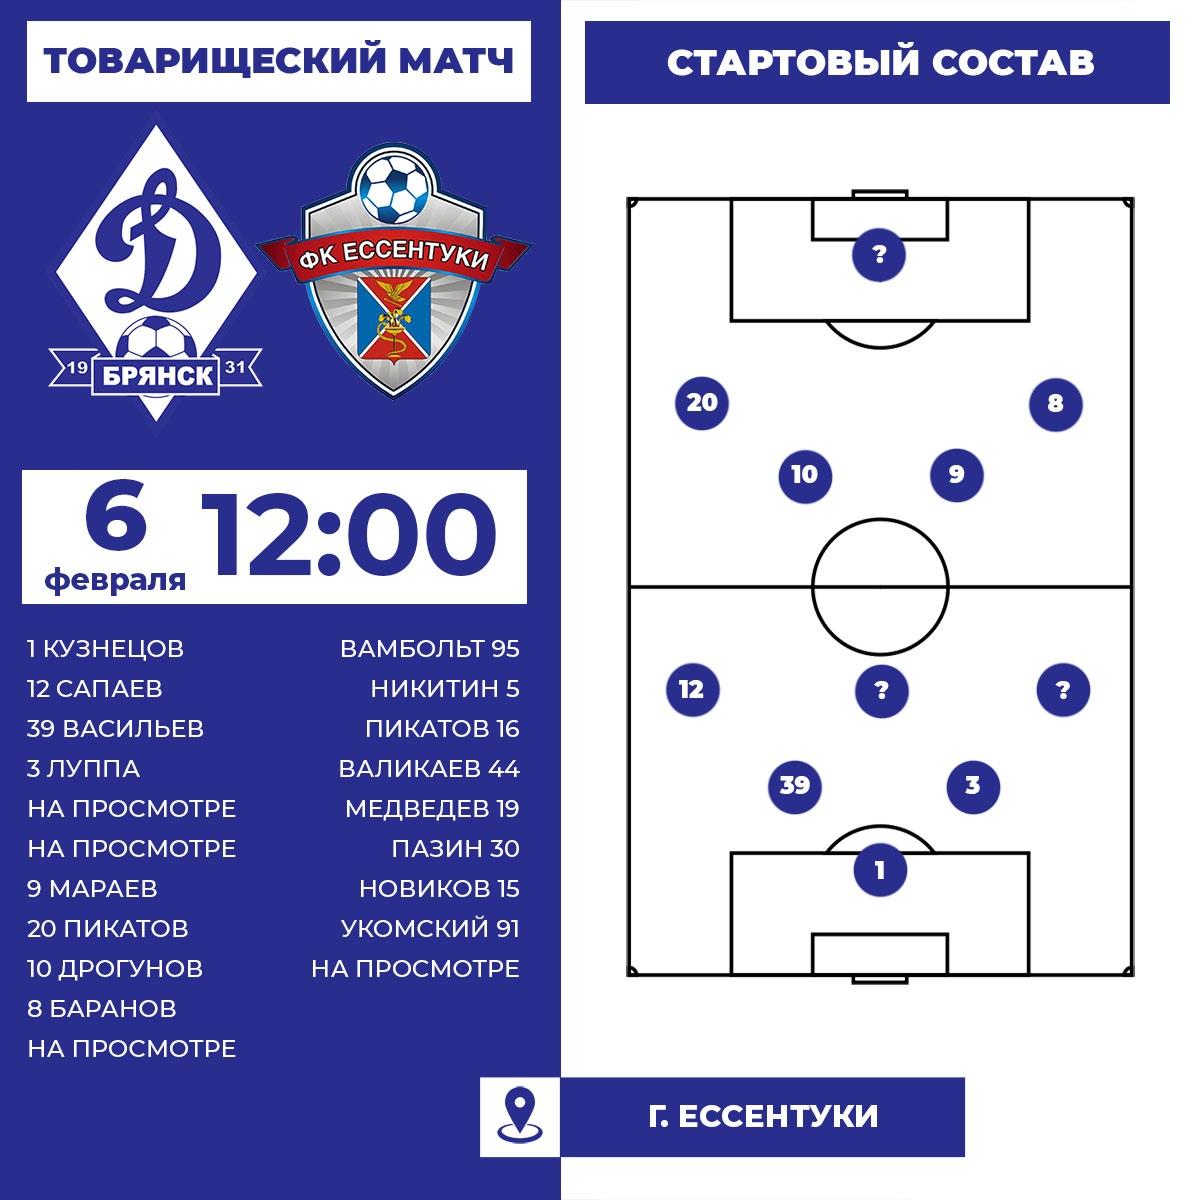 Ессентуки (Ессентуки) - Динамо (Брянск) 0:7